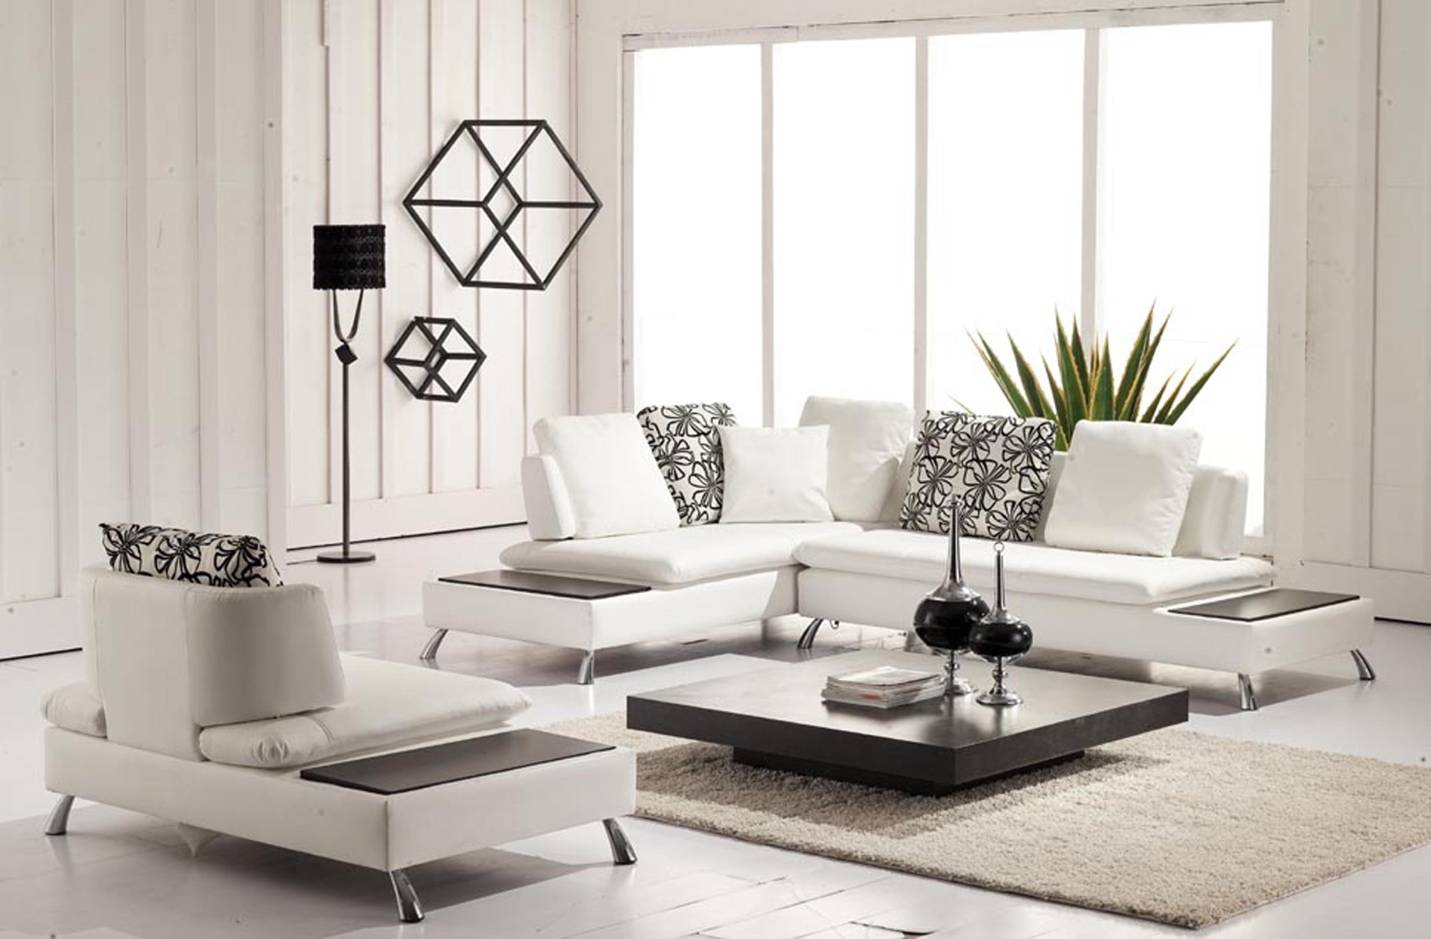 Interior Design and Home Decor Tips for Modernizing Your Home